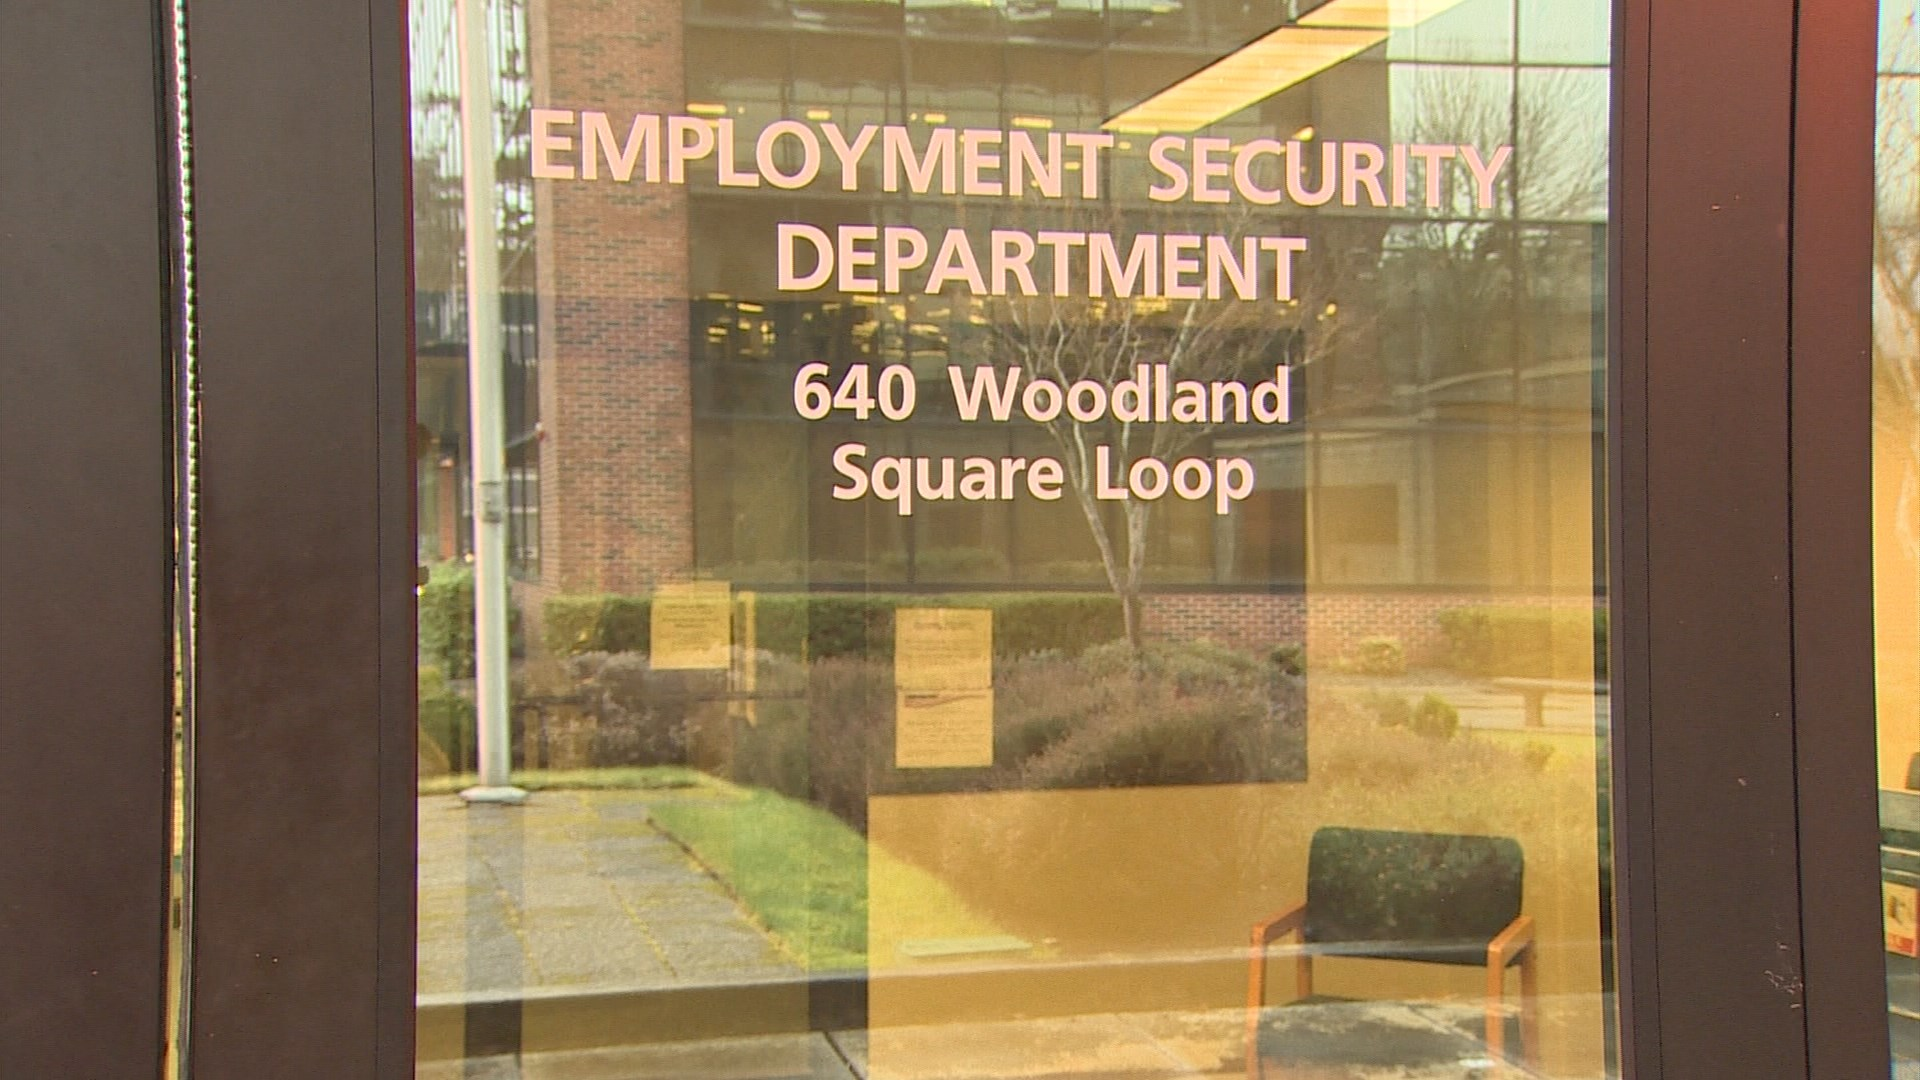 Washington Unemployment Rate At 51 Percent